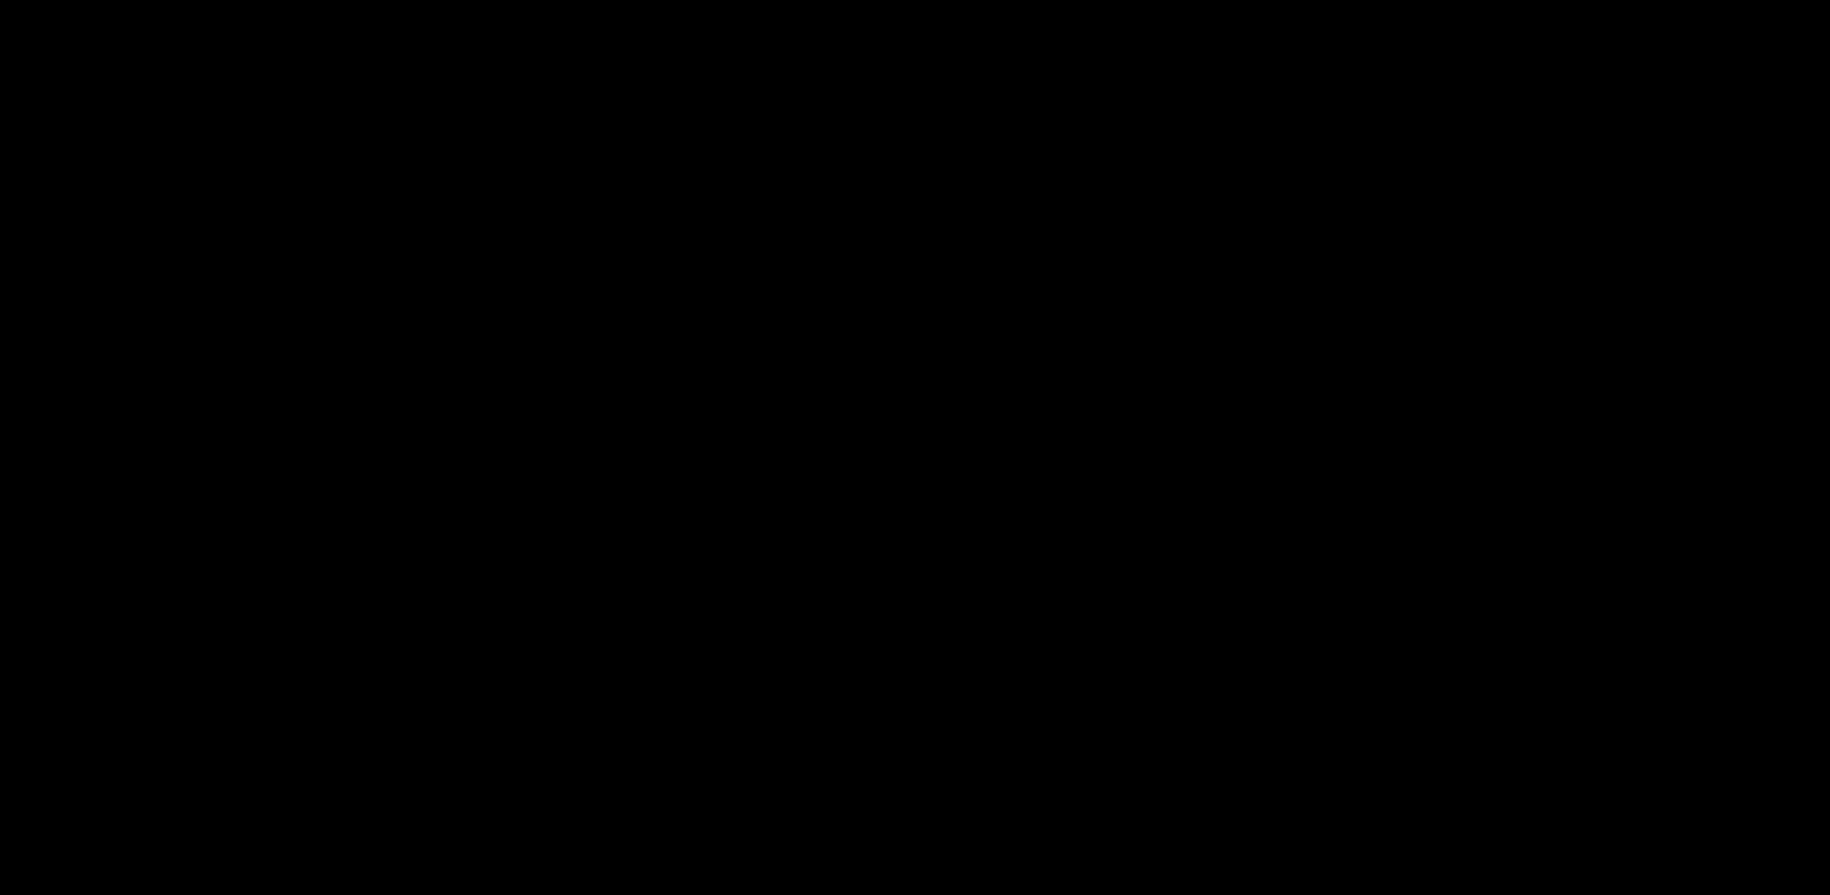 cl1-2-26